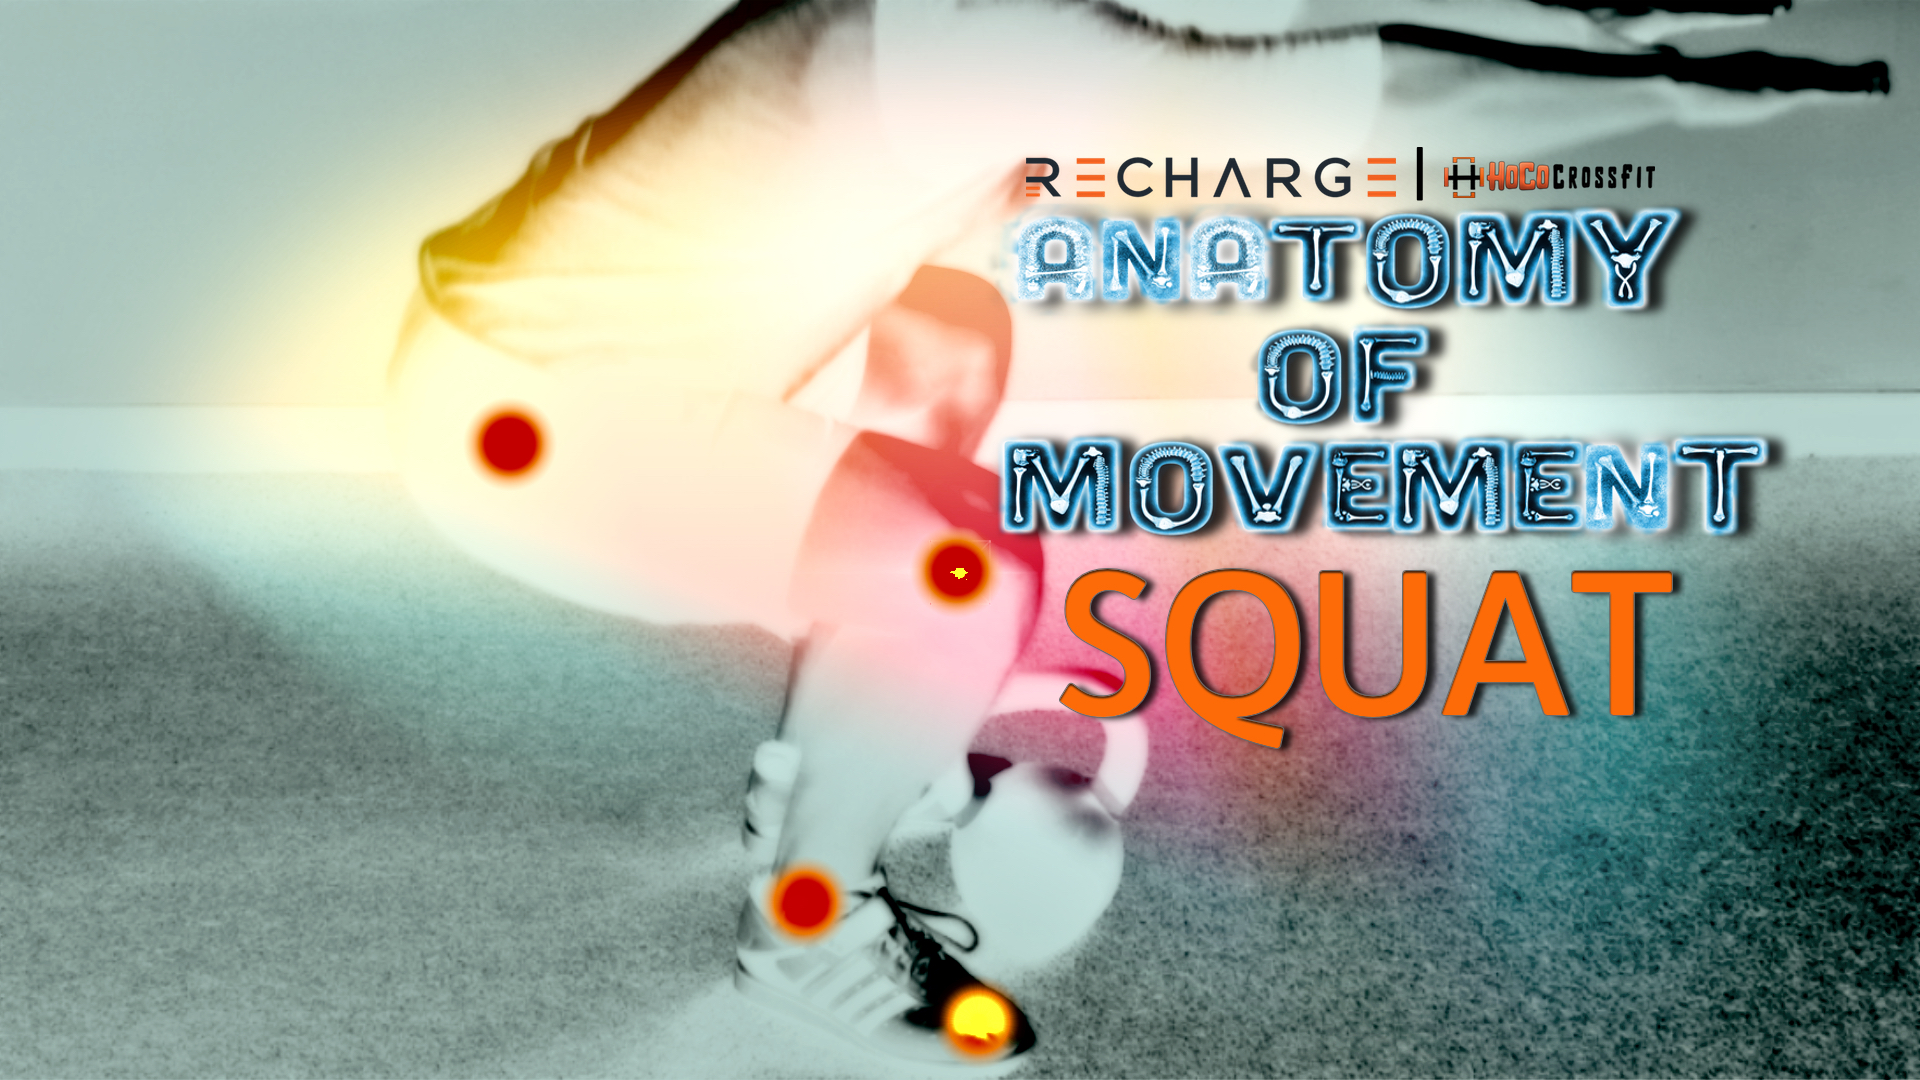 Anatomy of Movement: The Squat - Recharge|HoCo CrossFit